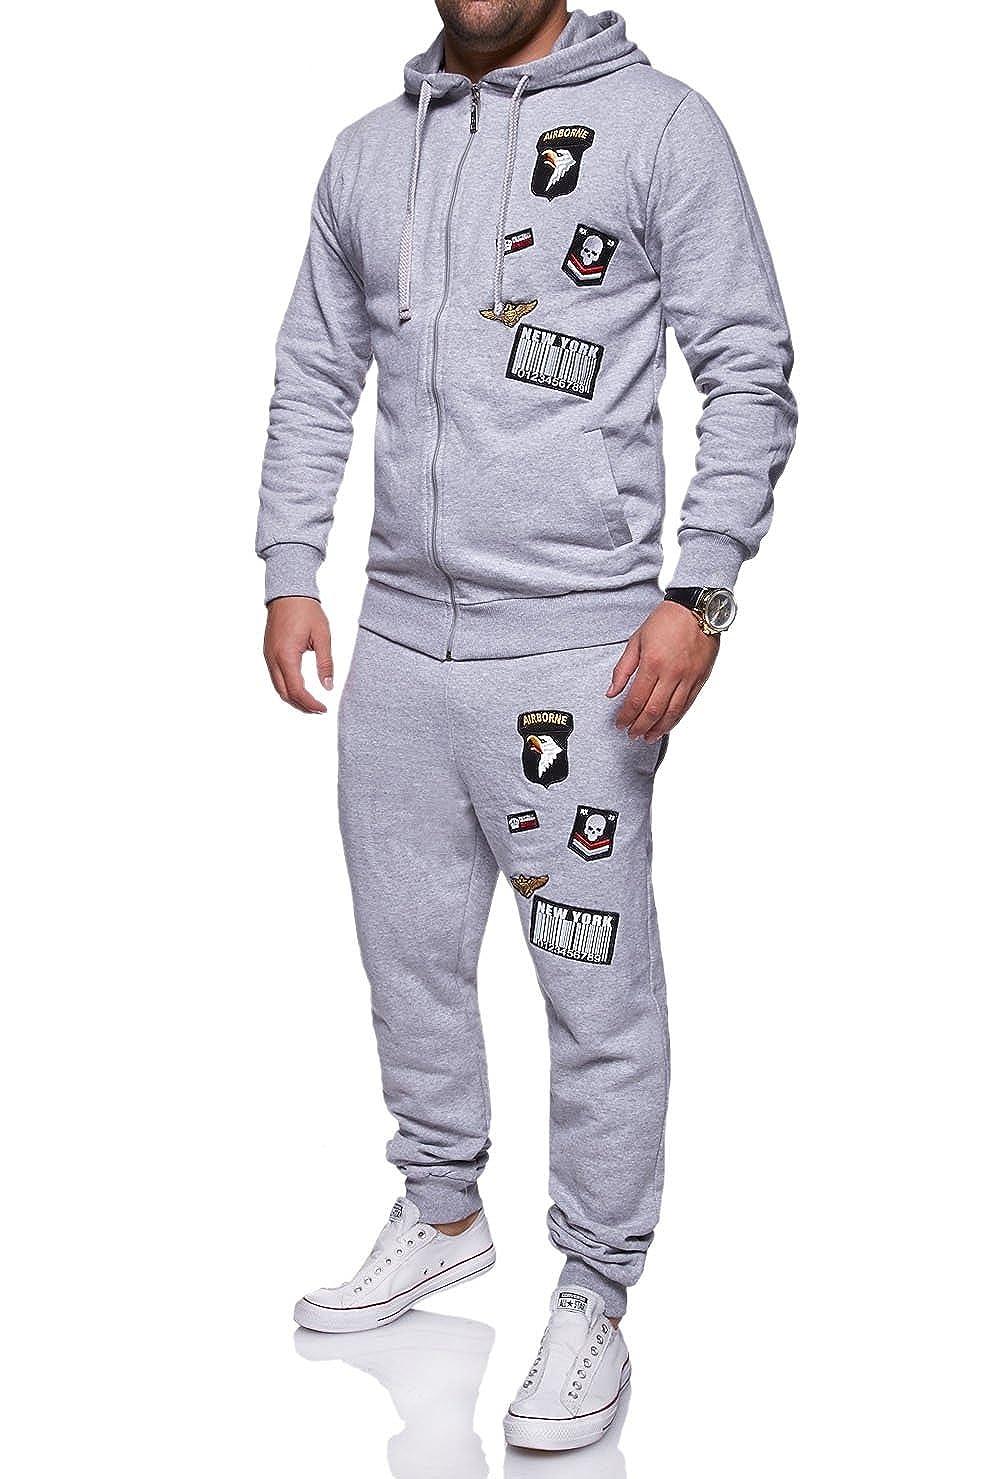 d1a7729b30 Sports et Loisirs sweat-Shirt FLY jogging survêtement R-685 MYTRENDS Styles  MT Styles ensemble pantalon ...